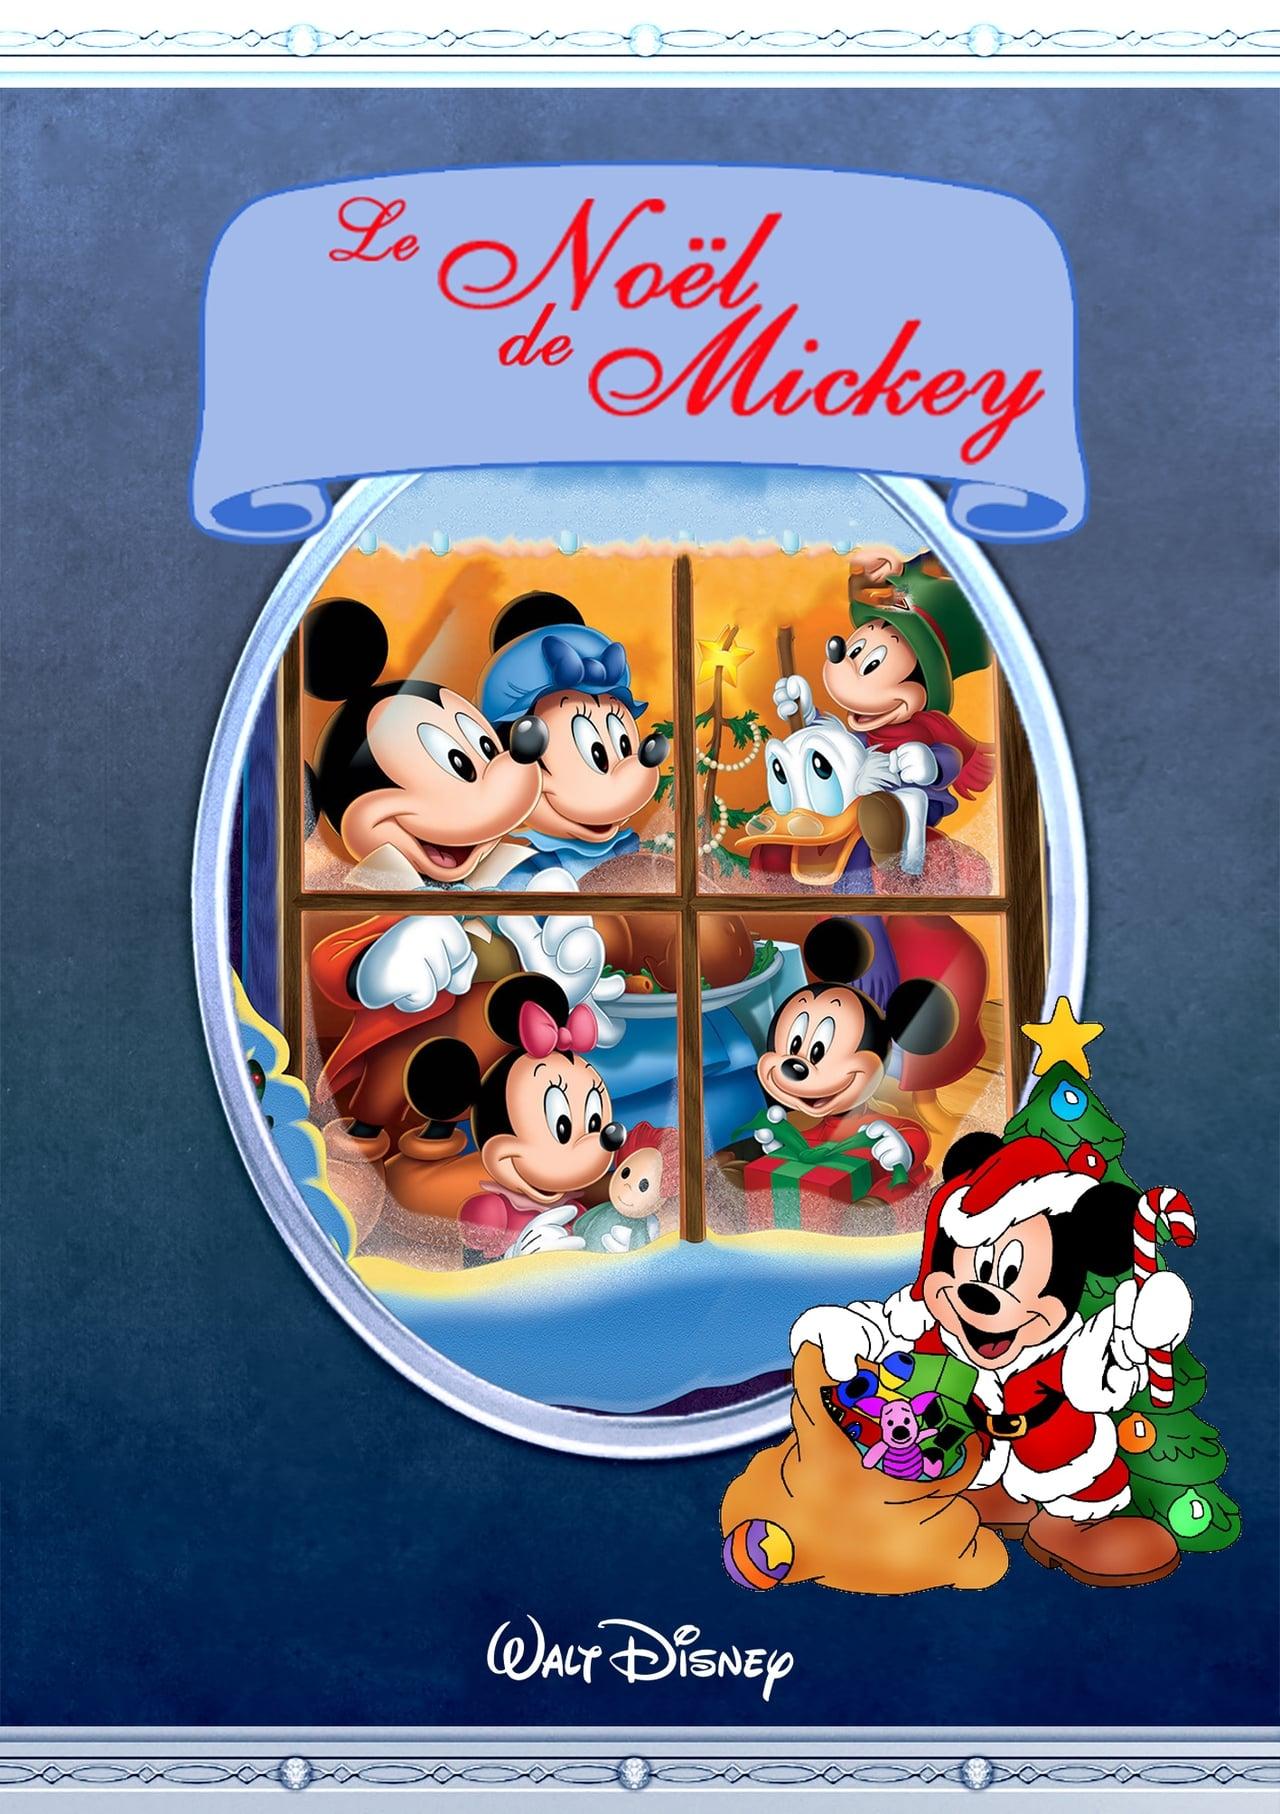 Free Watch Mickey's Christmas Carol (1983) Summary Movies at live.movieonrails.com